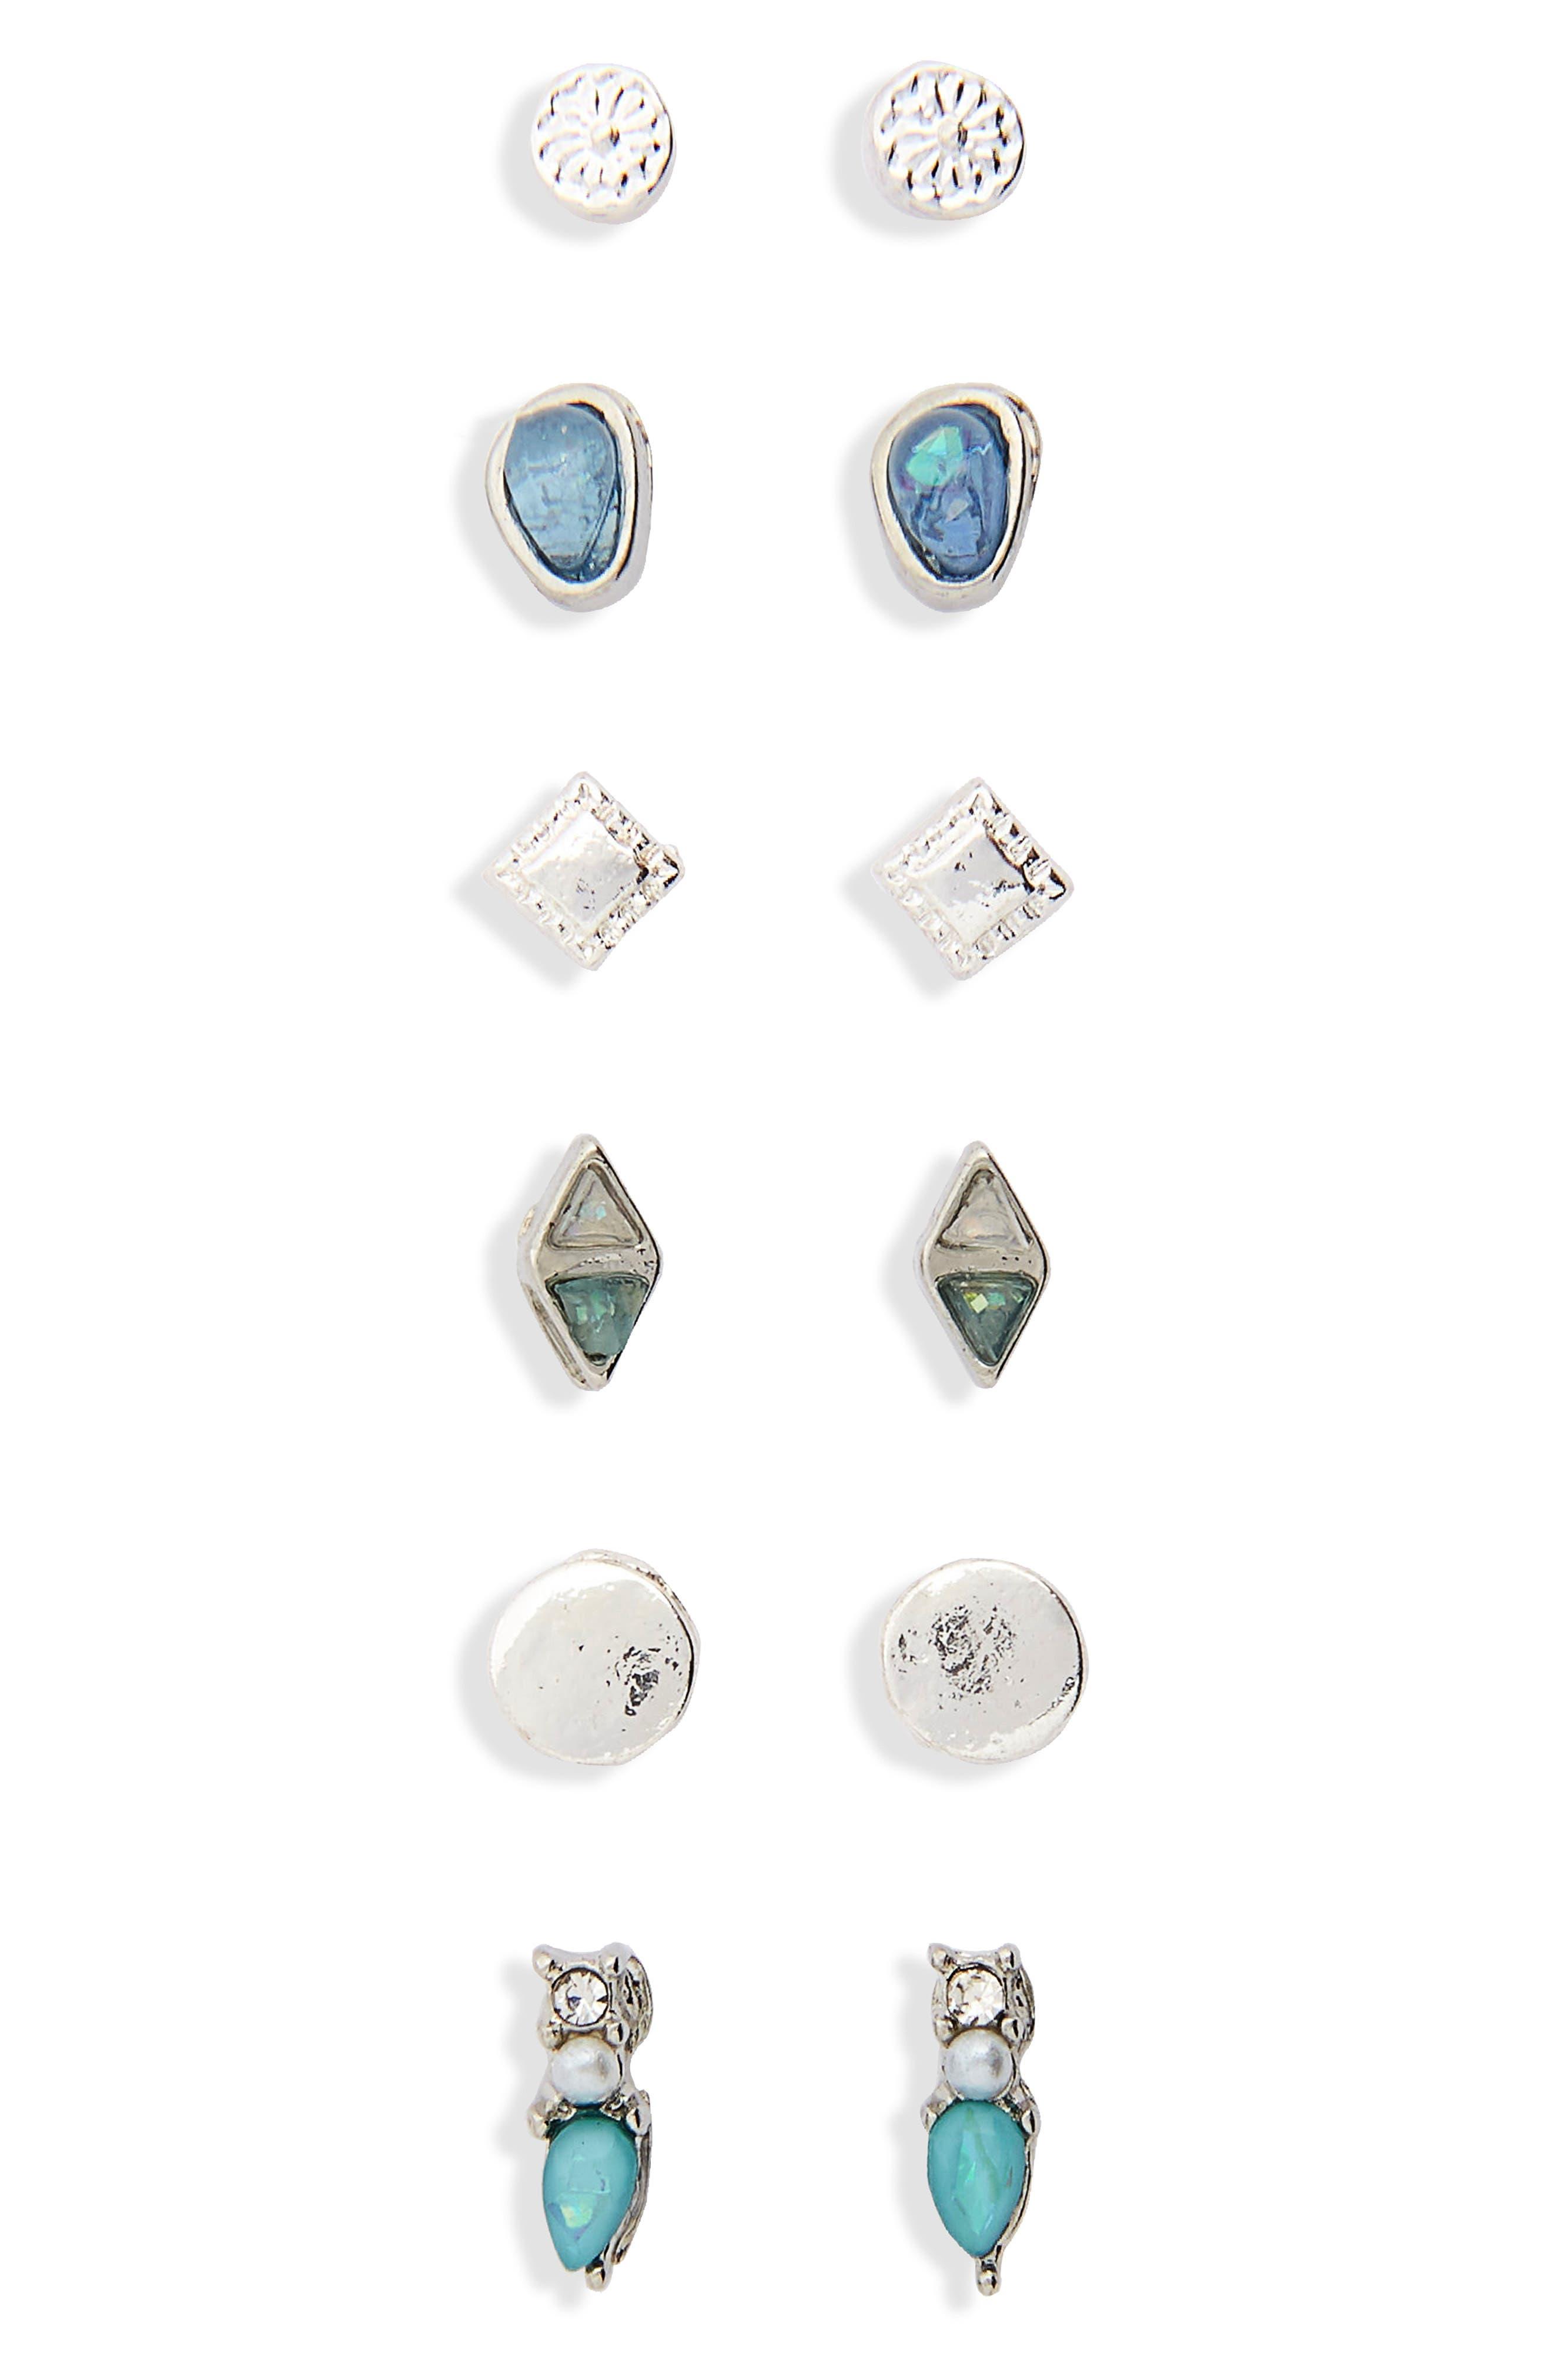 6-Pack Dainty Stone Stud Earrings,                         Main,                         color,